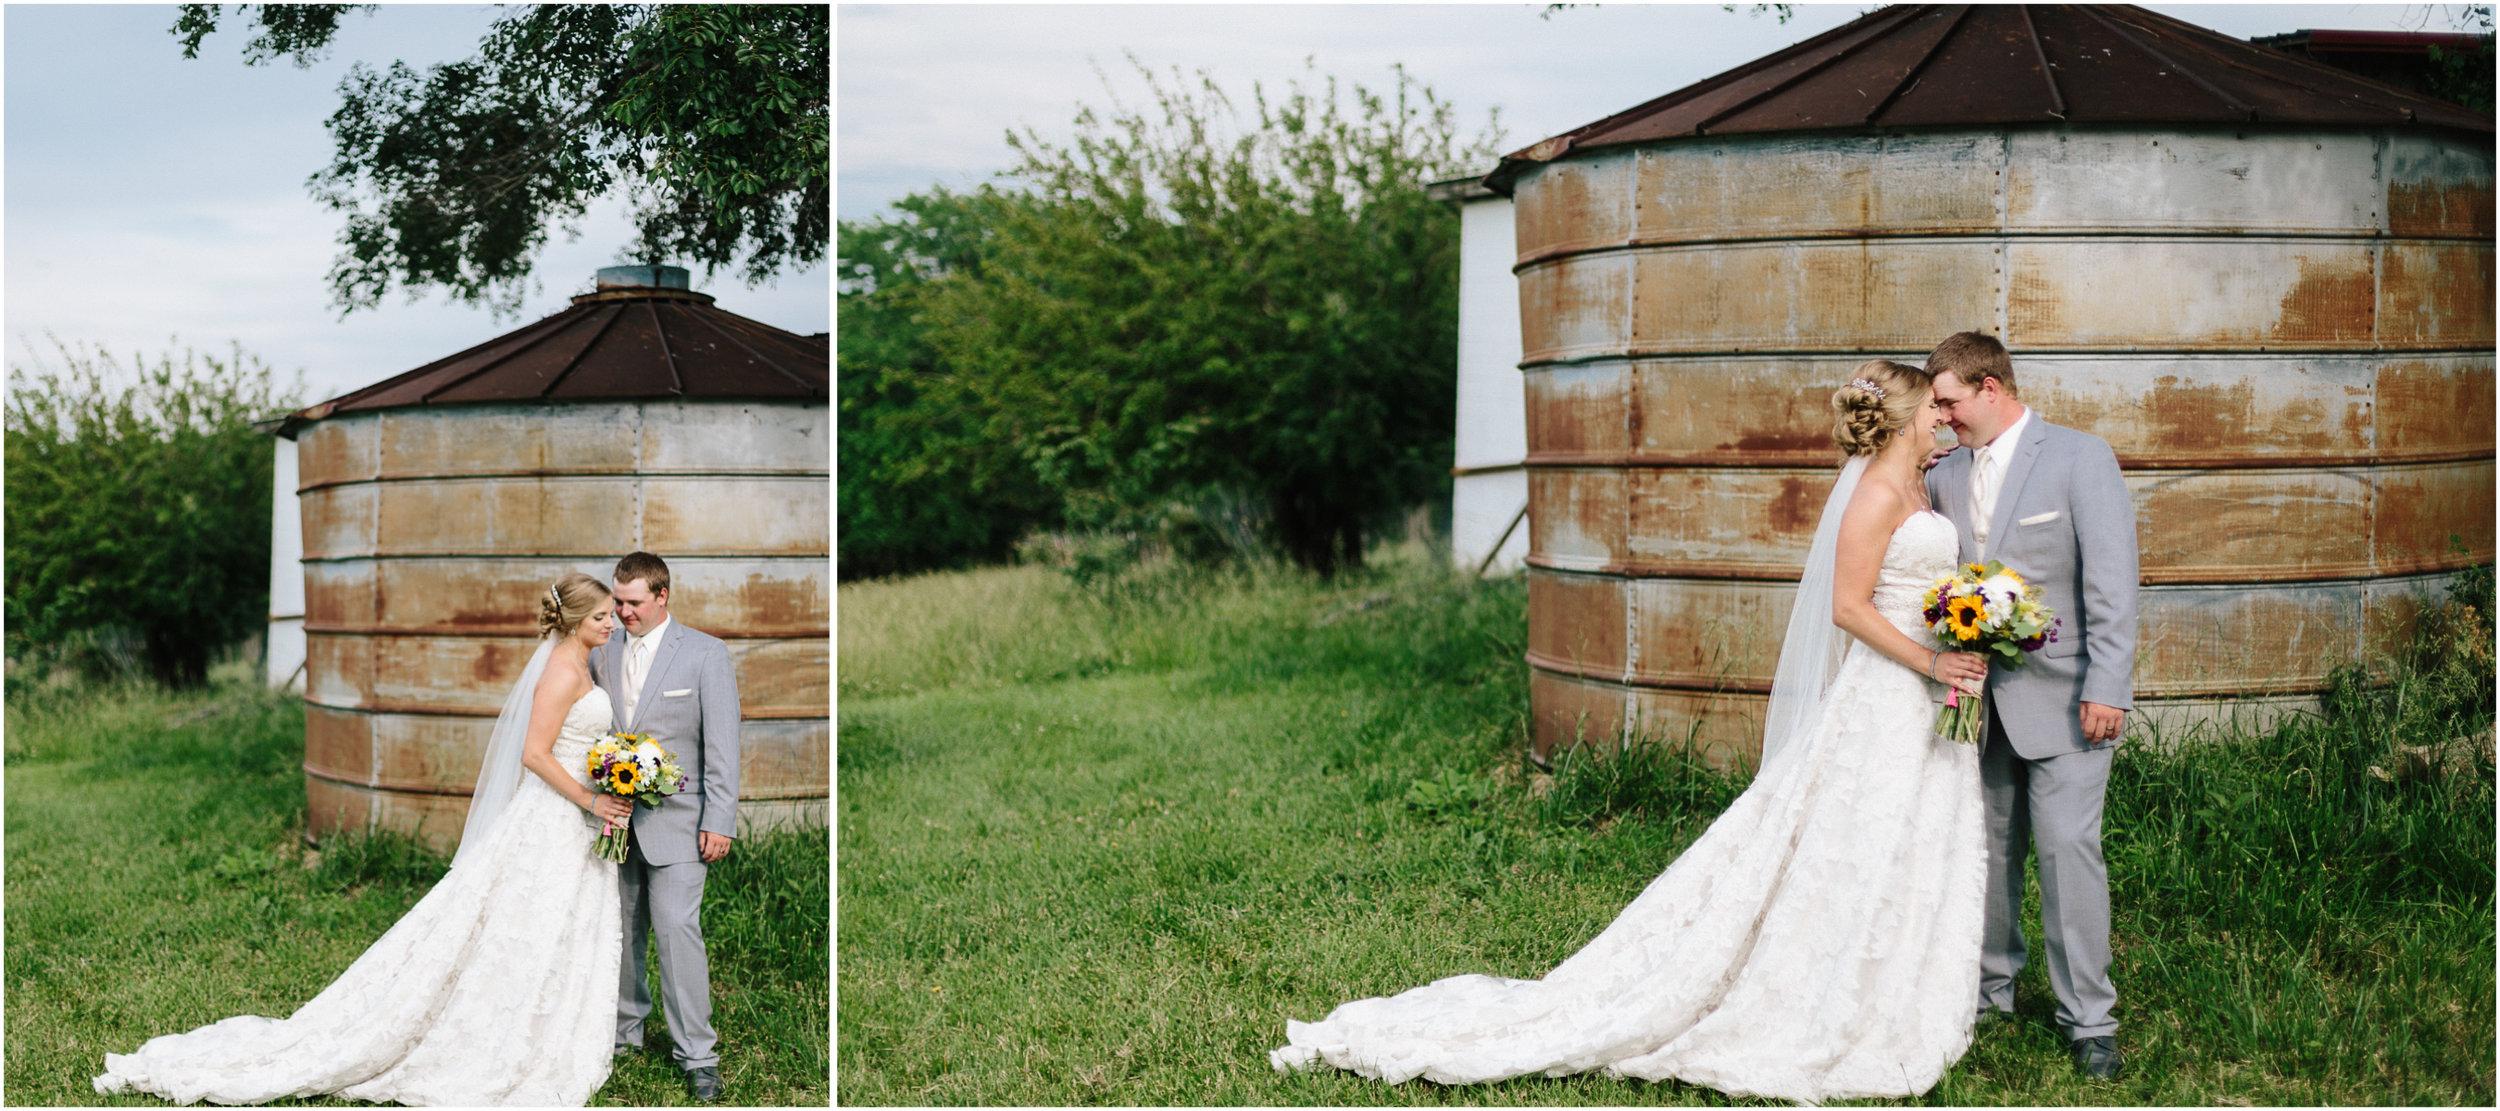 alyssa barletter photography louisburg kansas town square paola rustic wedding-40.jpg